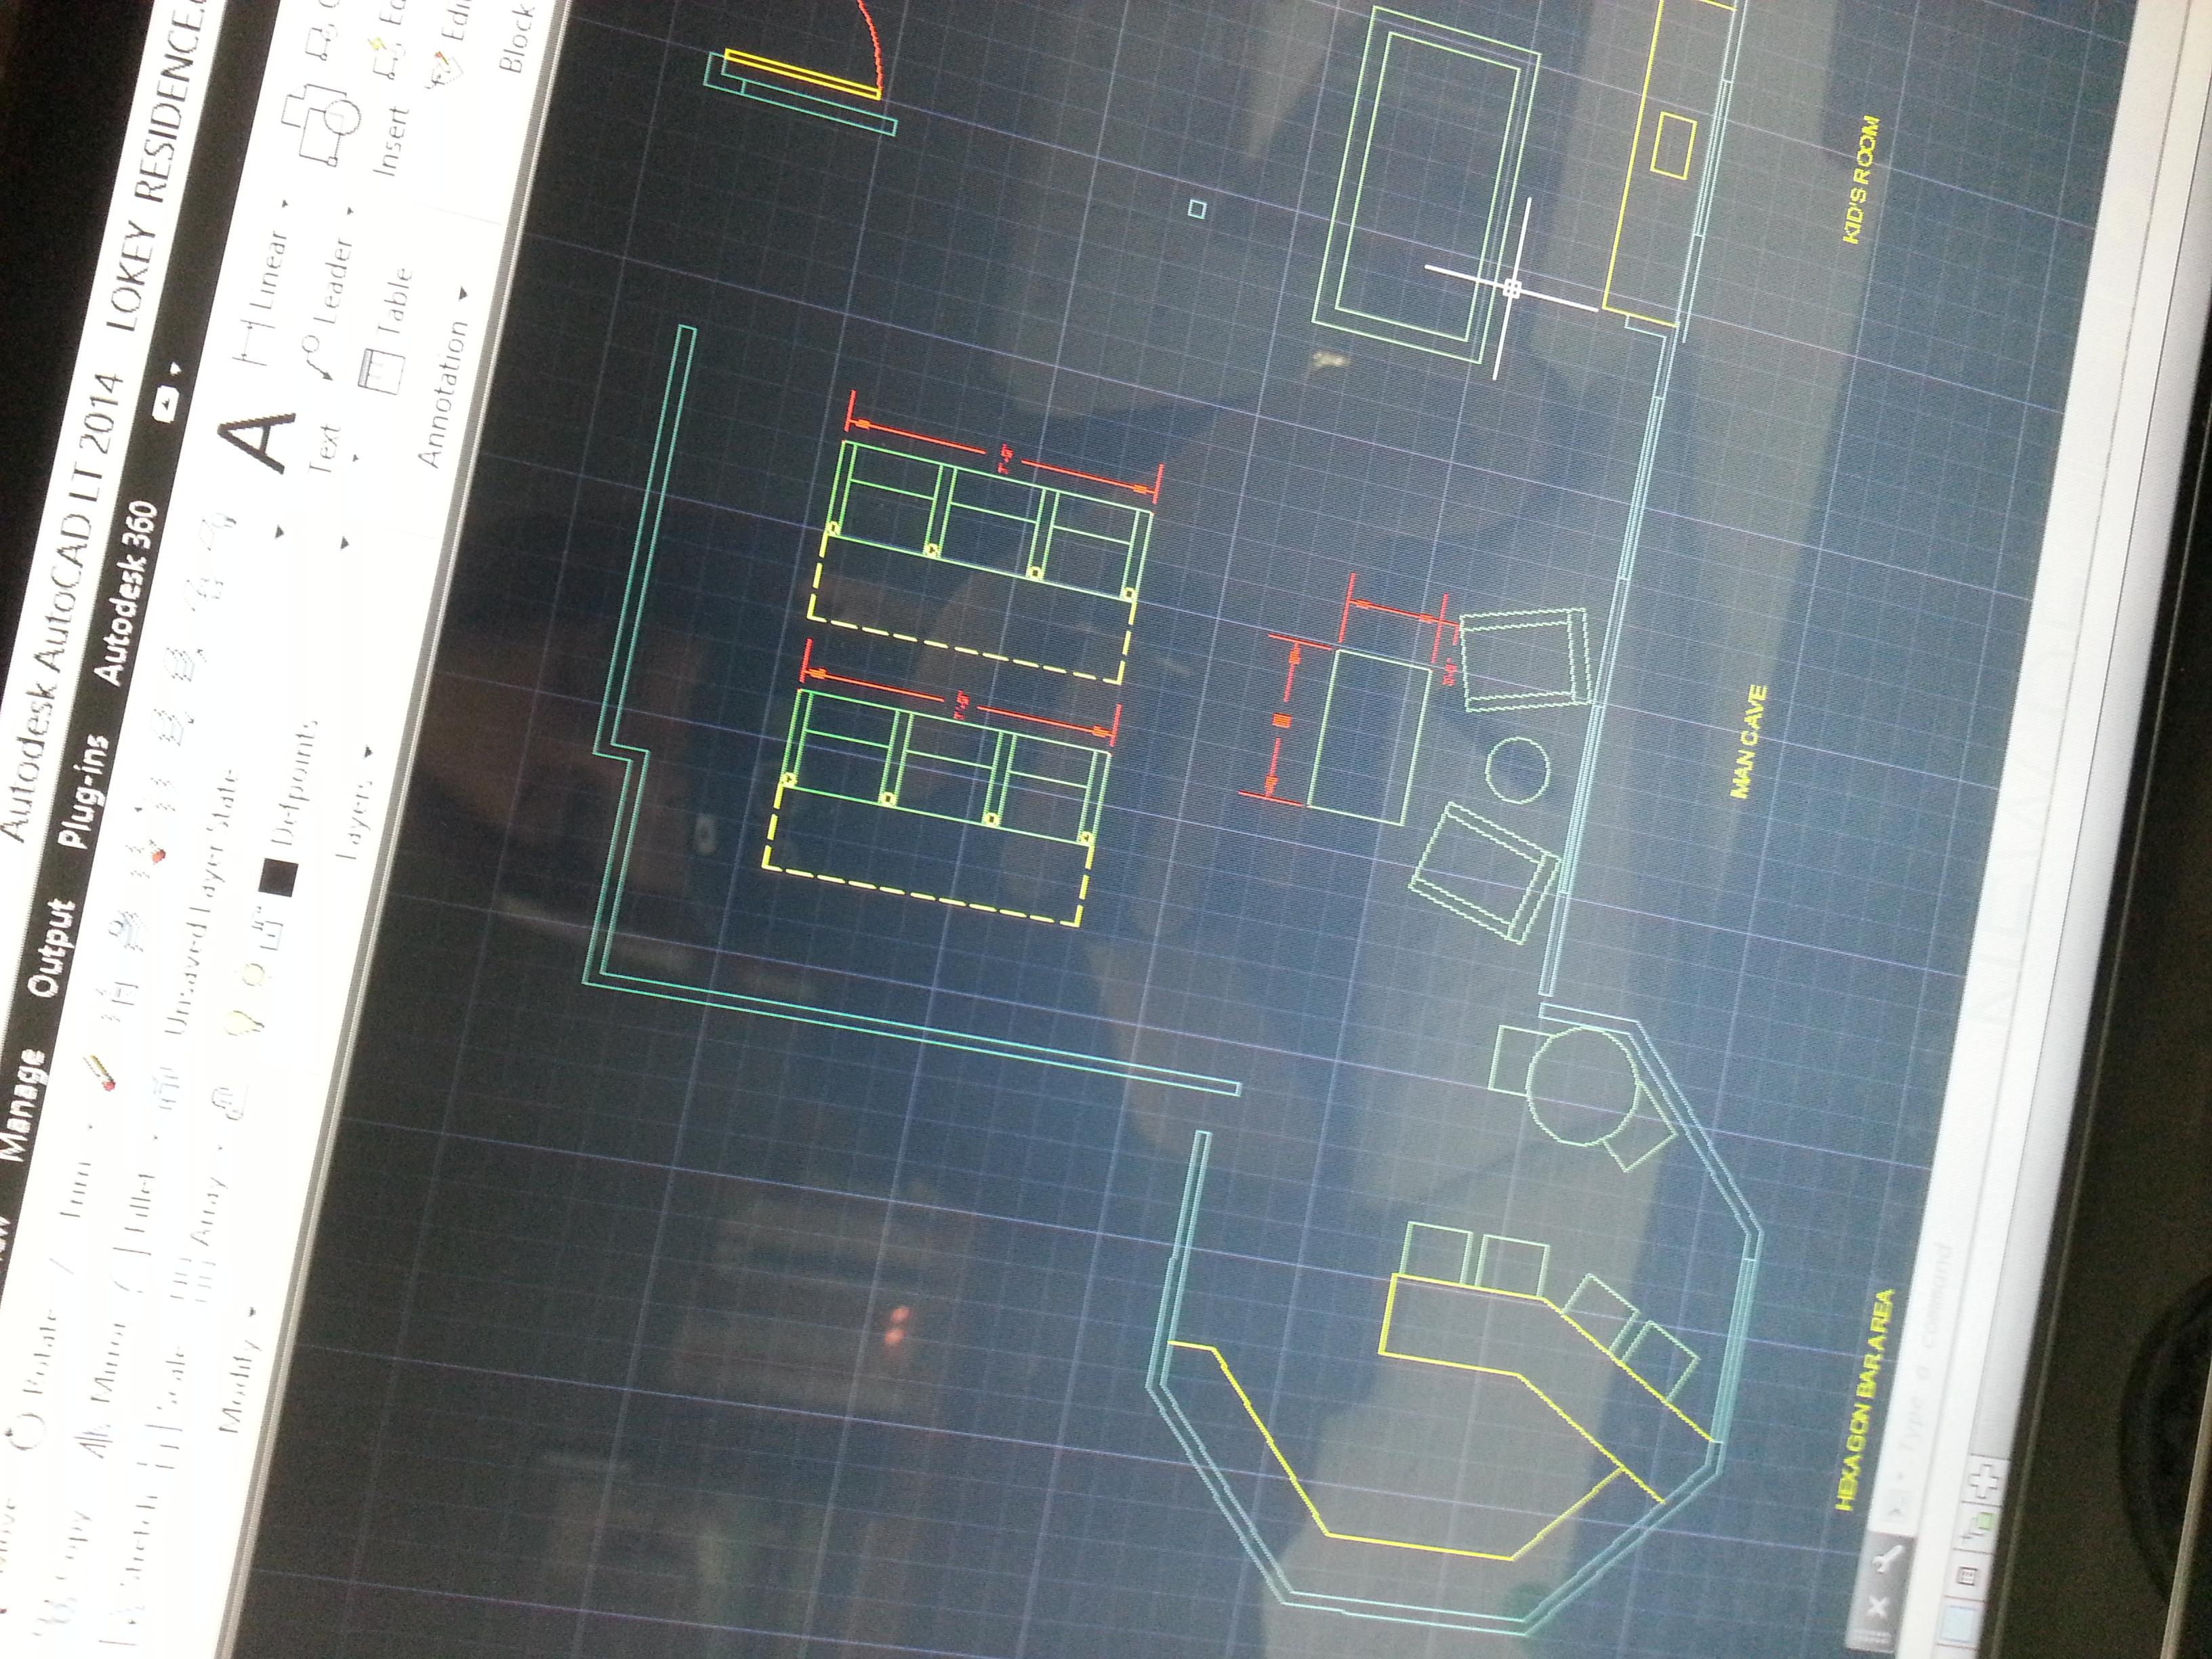 Mancave2.lisagilmoredesign